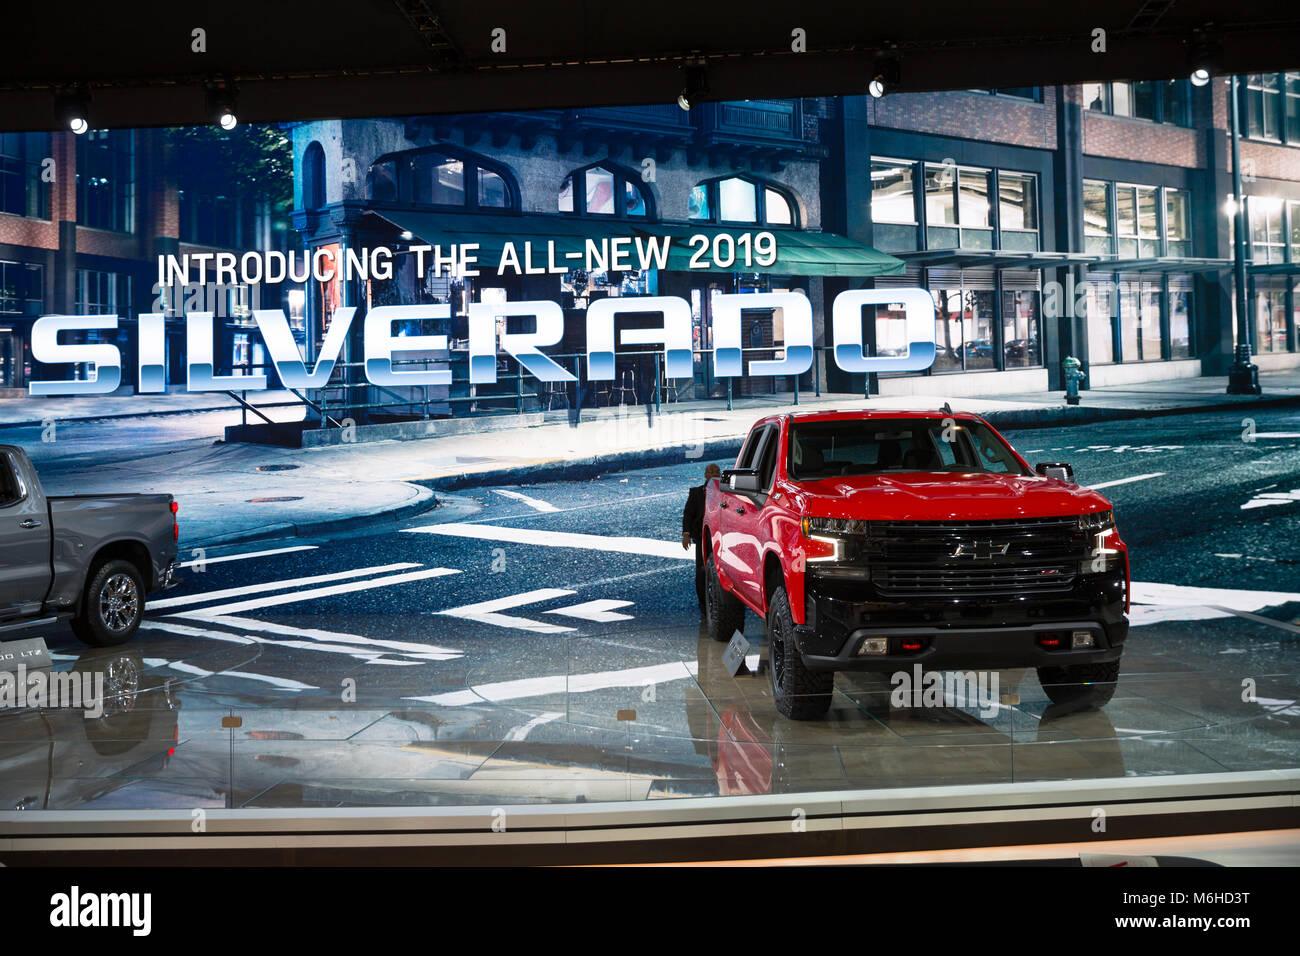 New 2019 Chevrolet Silverado 2018 Chicago Auto Show Stock Photo